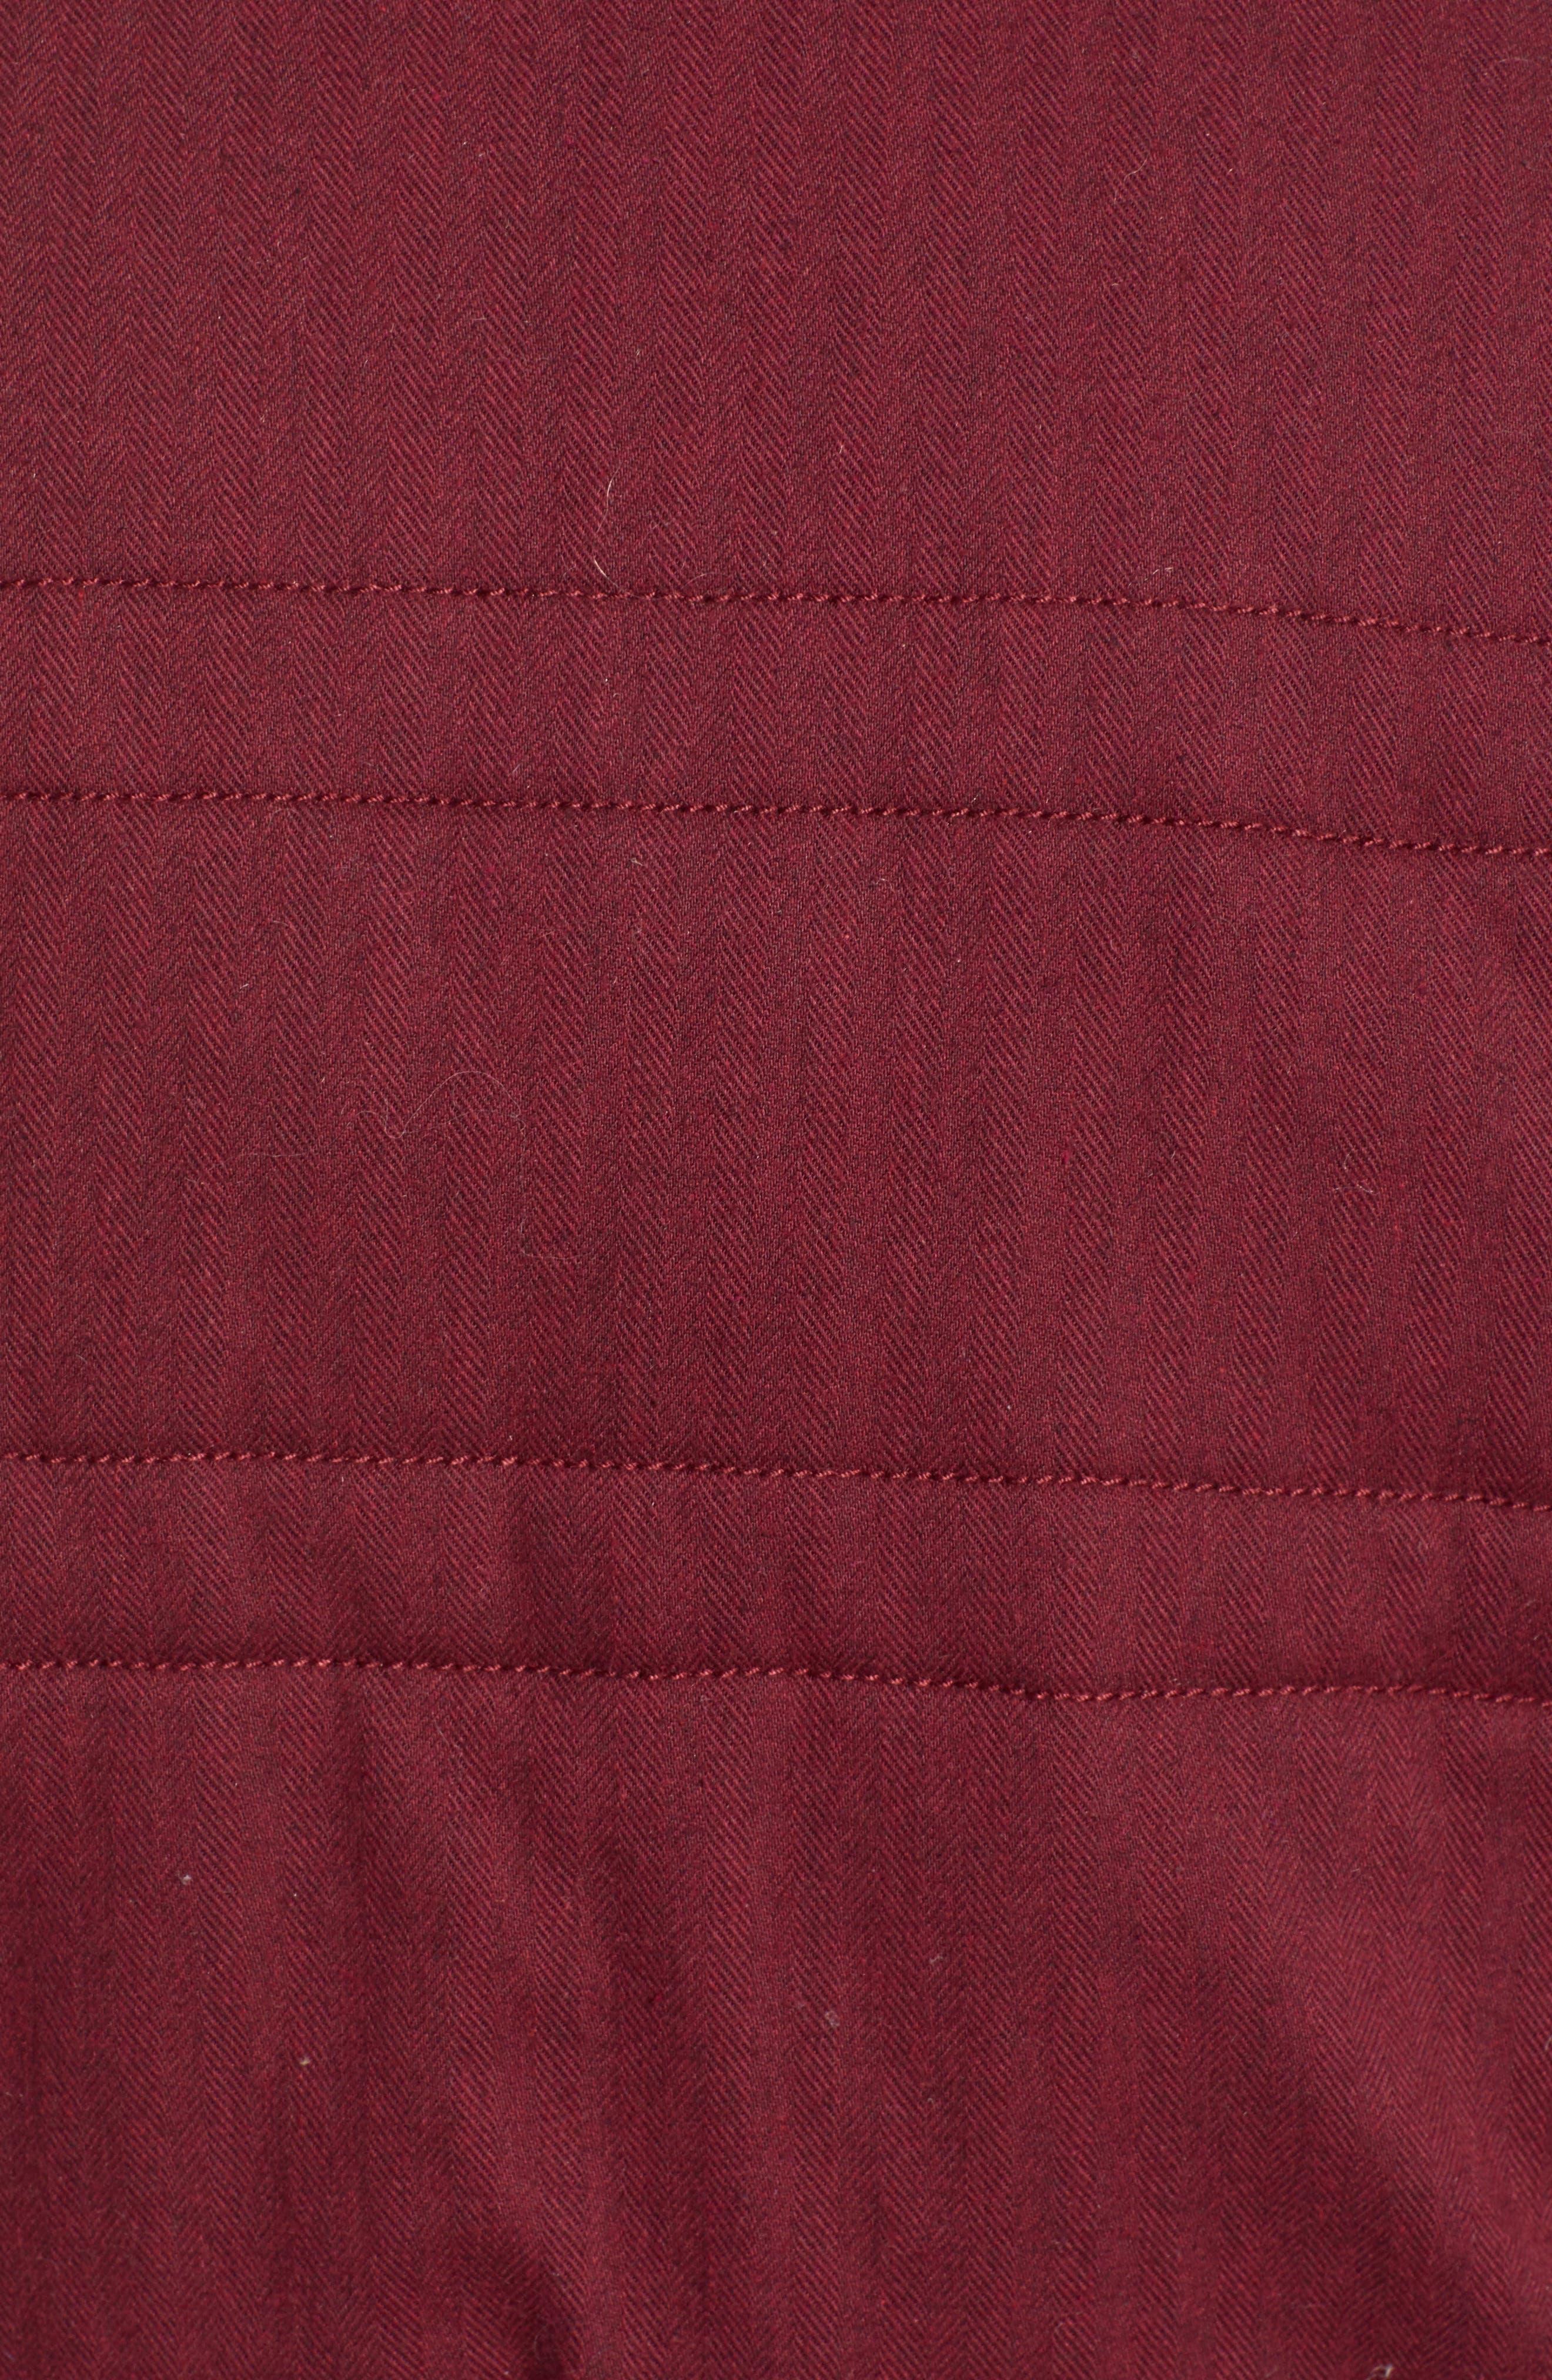 TREASURE & BOND, Flannel Crop Puffer Jacket, Alternate thumbnail 6, color, RED TANNIN HEATHER